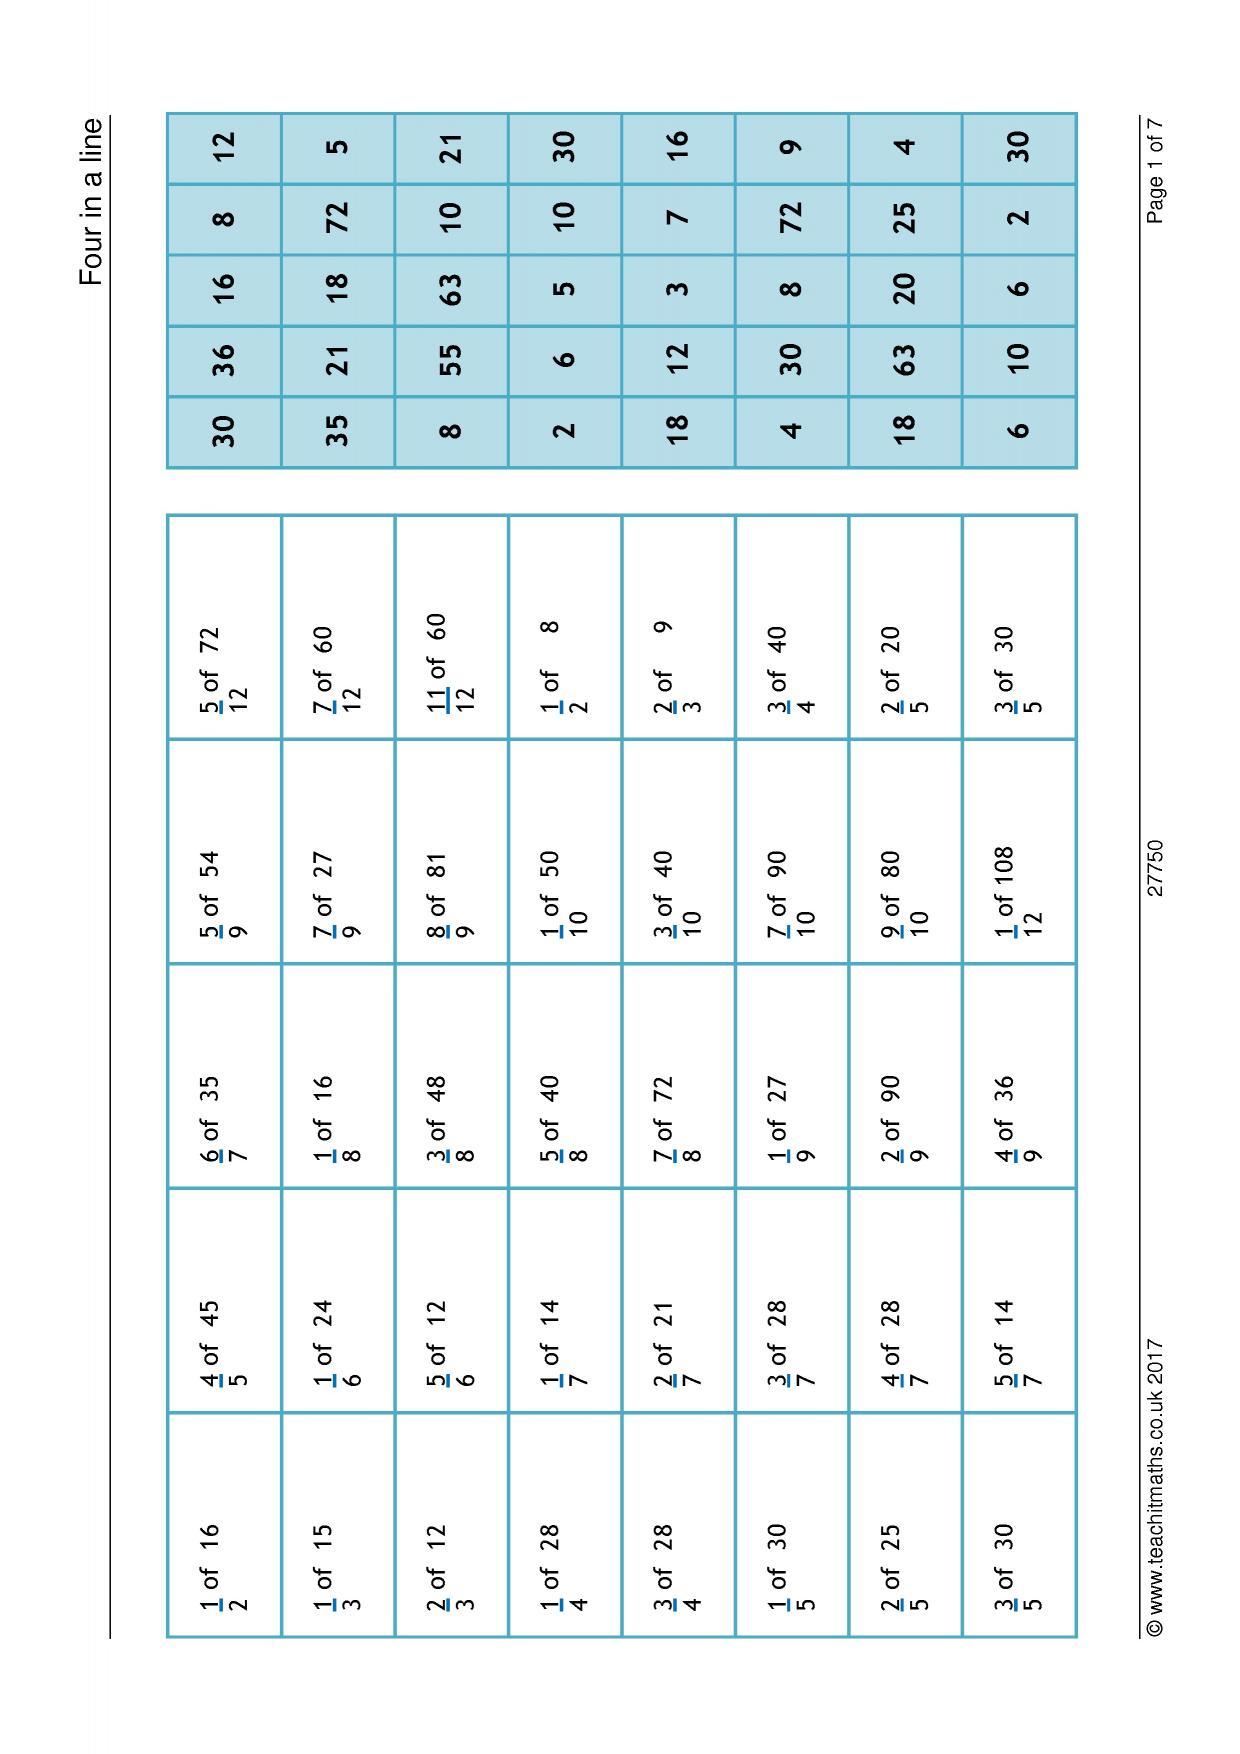 Worksheet On Fractions Of Amounts